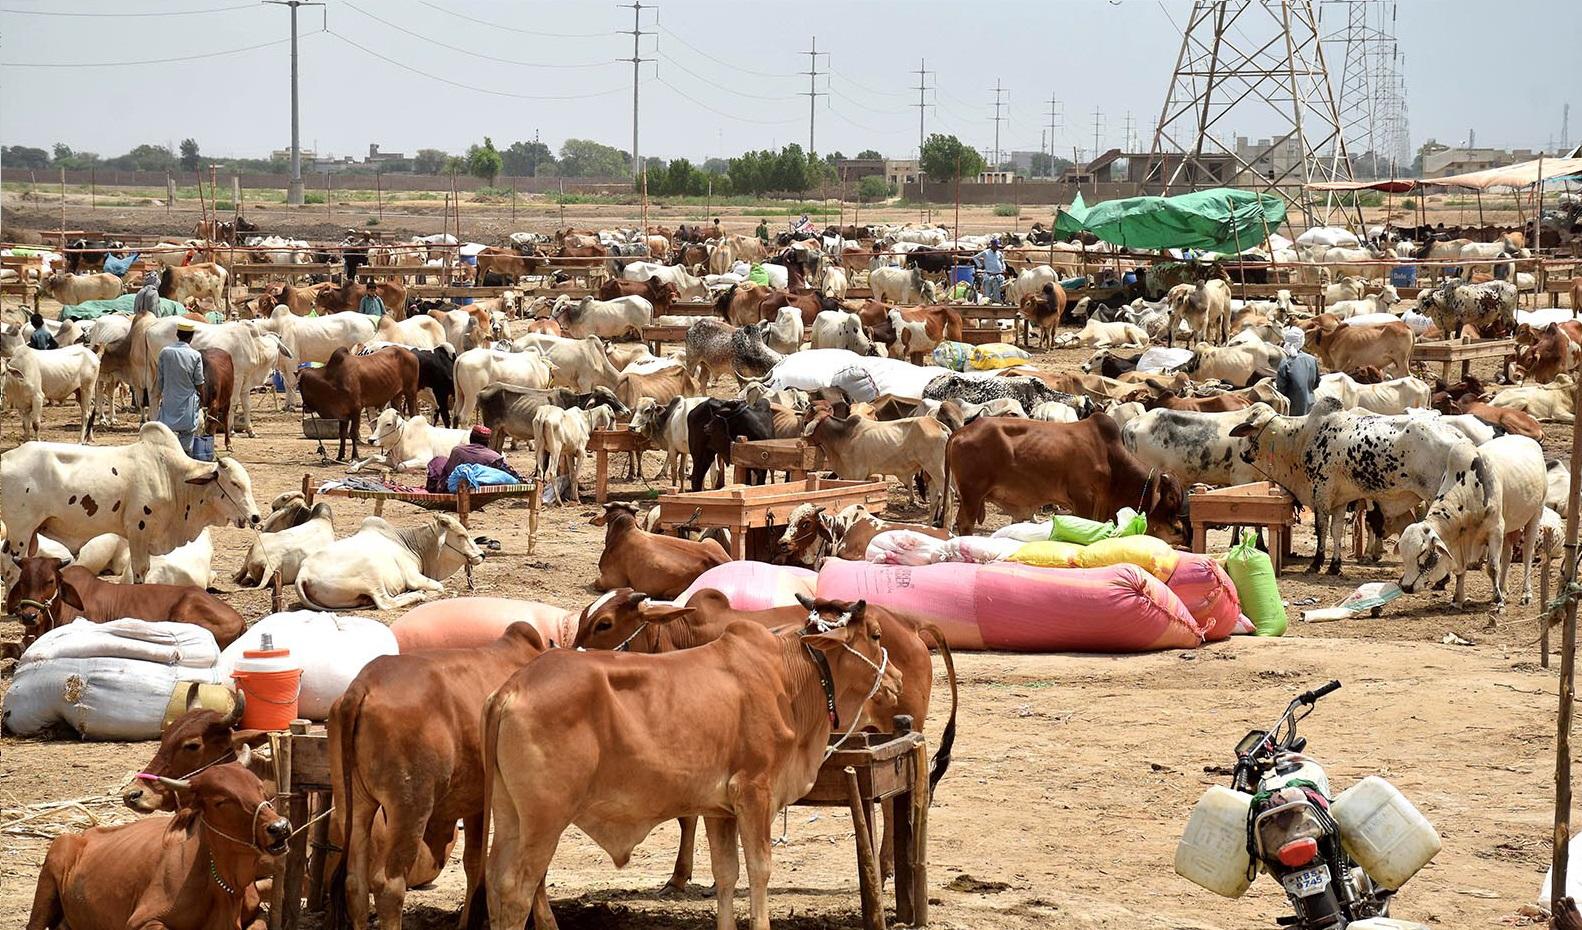 traditional livestock festival draws flocks of visitors